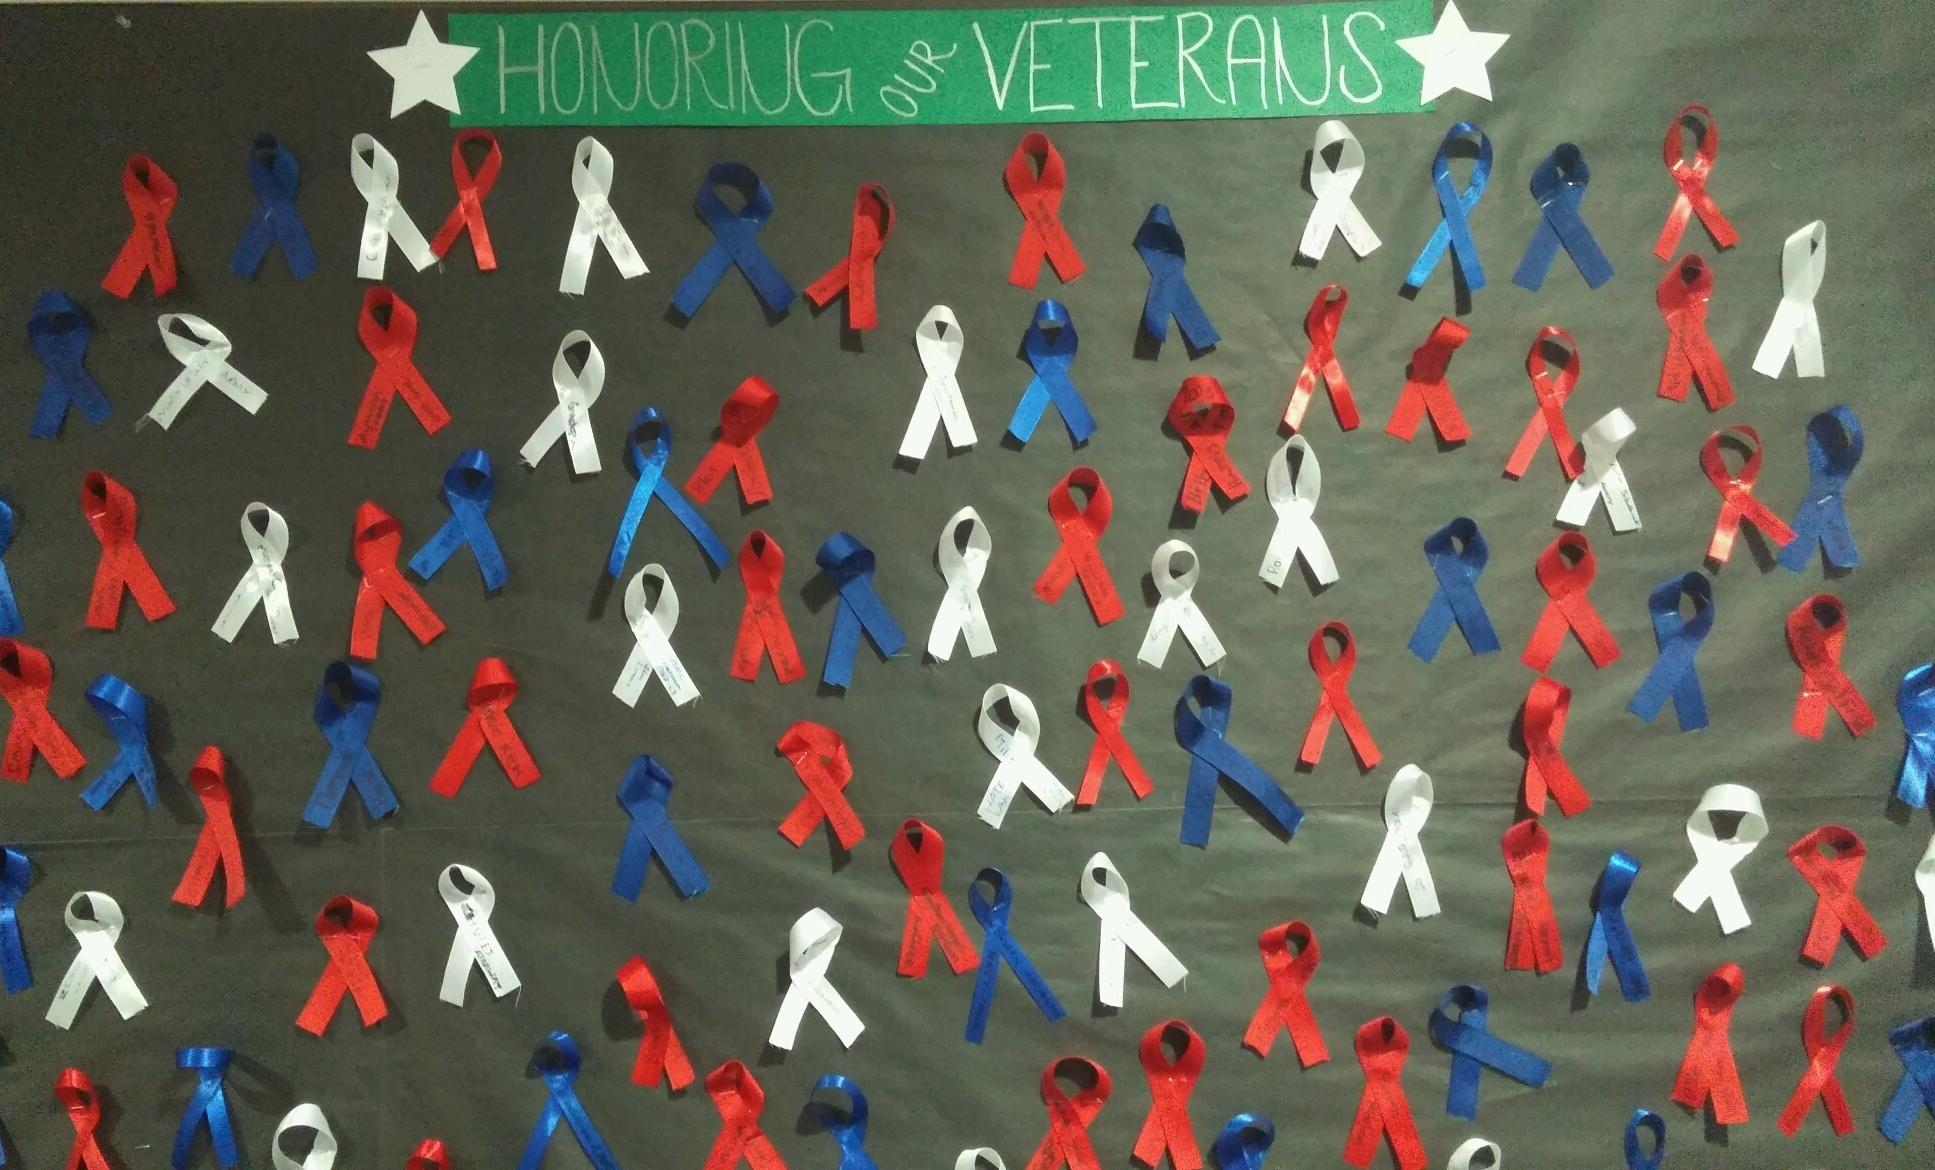 Veterans ribbon board